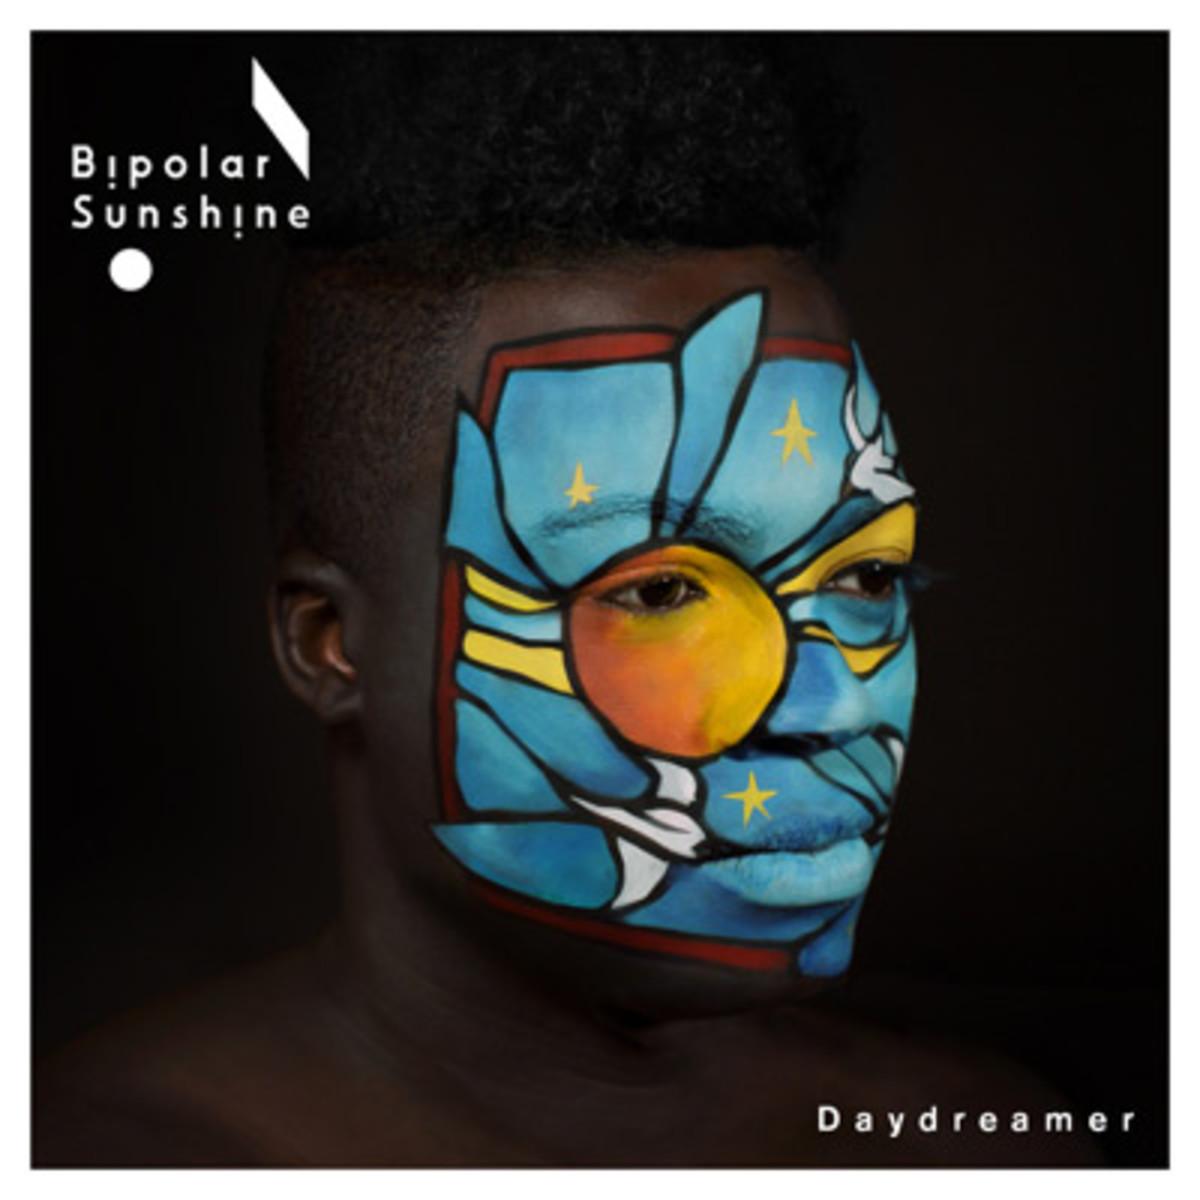 bipolarsunshine-daydreamer.jpg